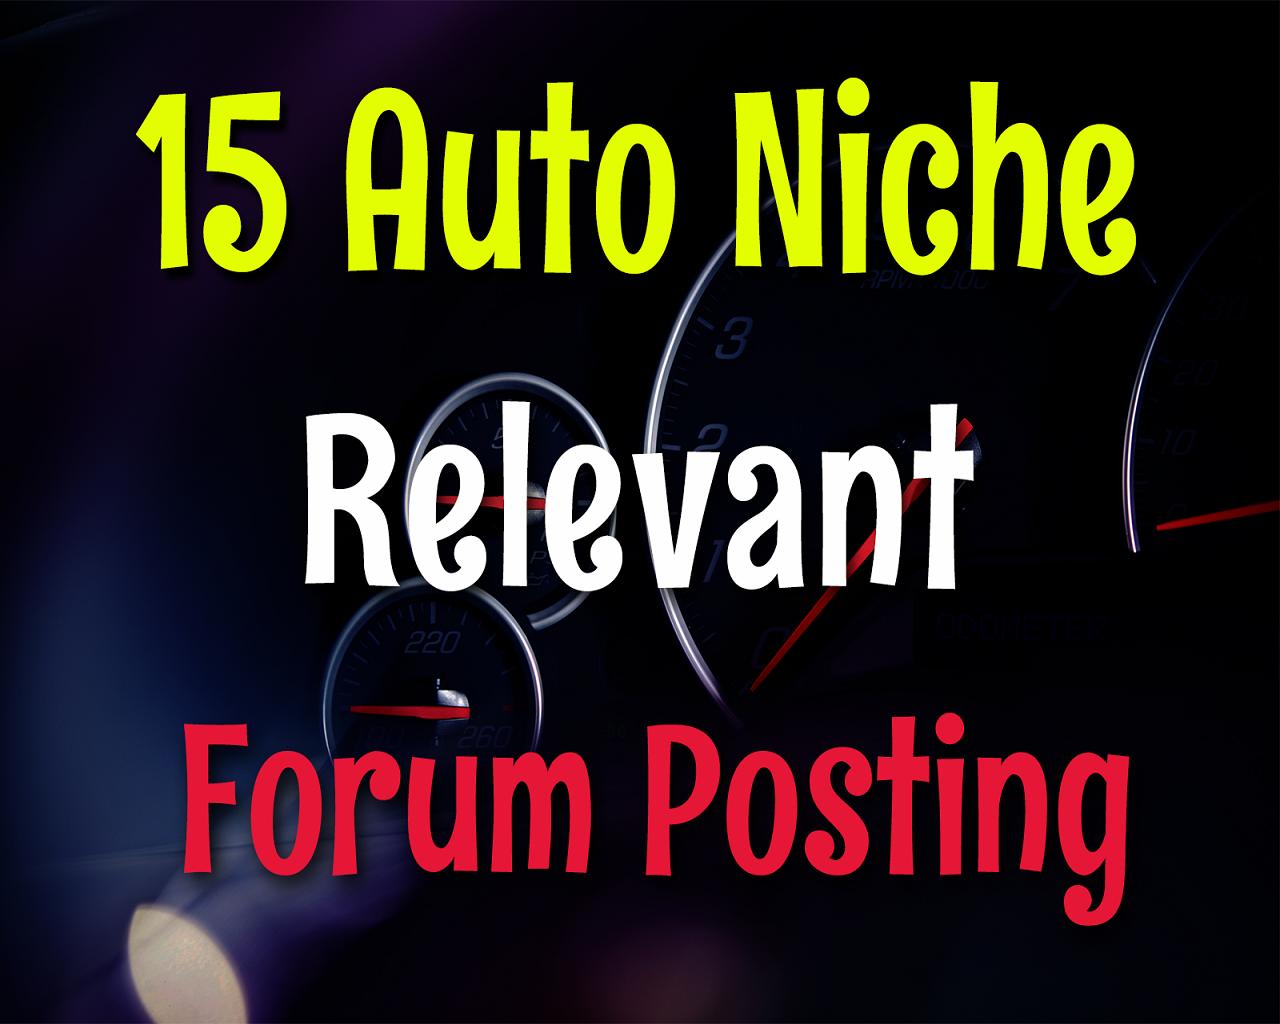 15 Auto Niche Cars,  Bikes,  Vehicles & Repairing Services Relevant Forum Posting Backlinks